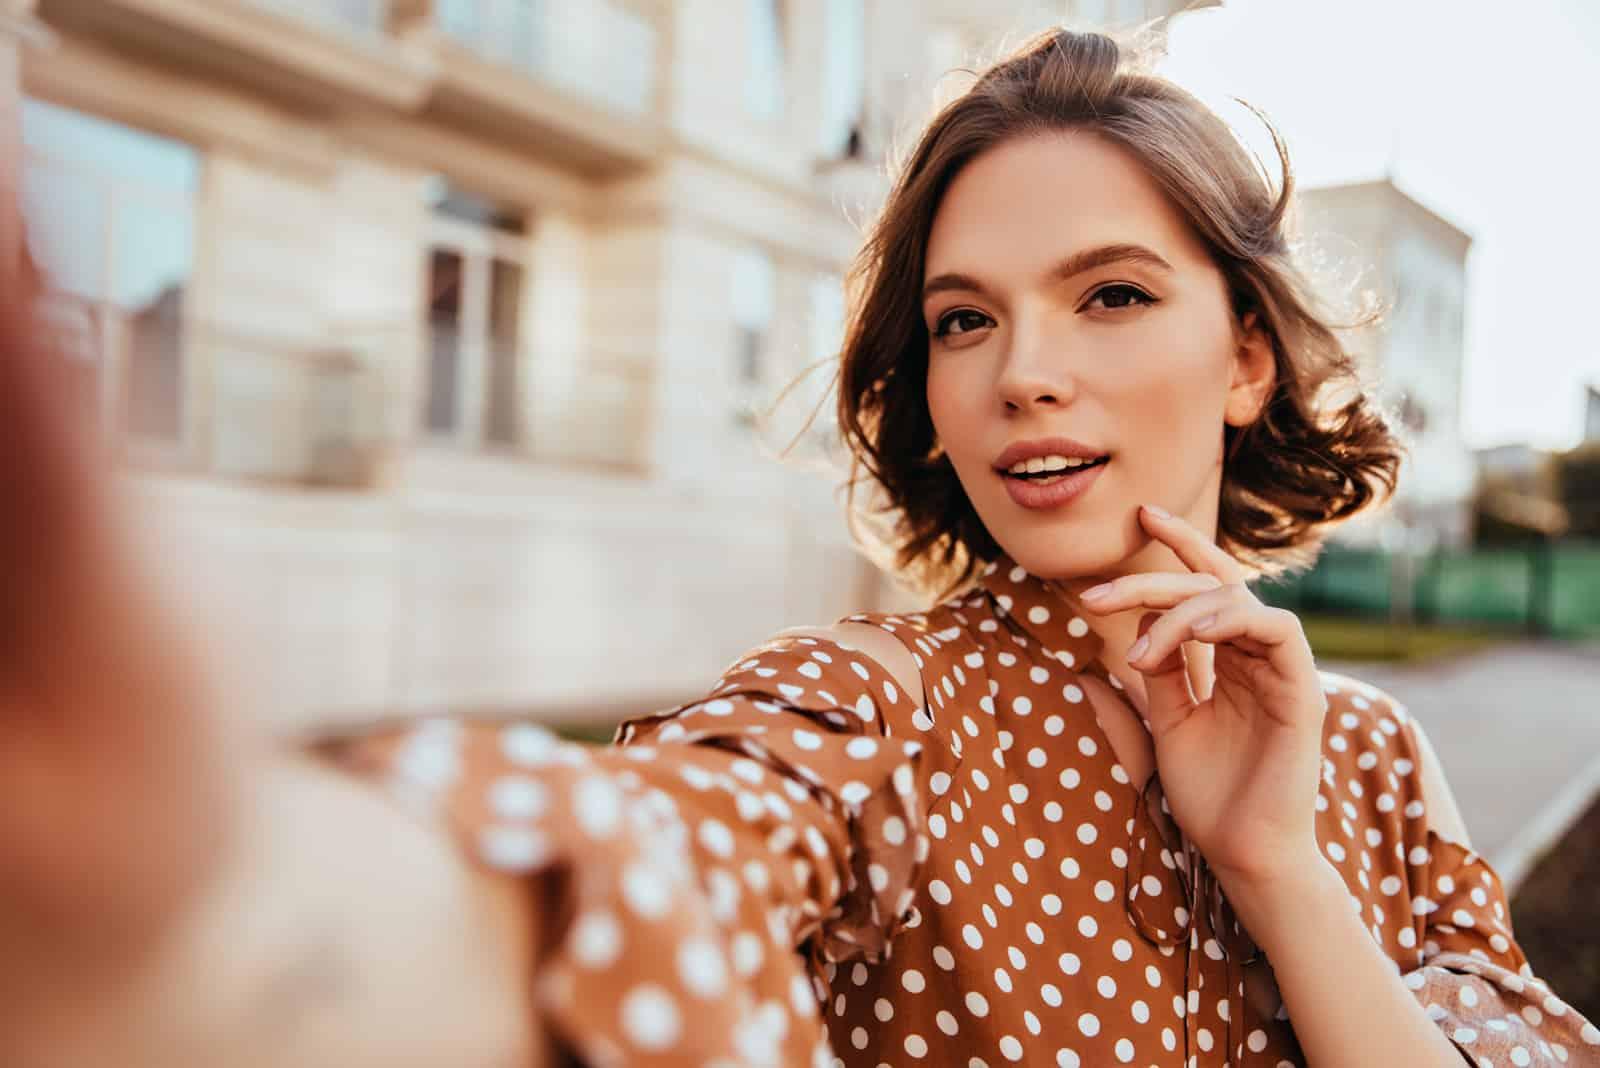 Frau in brauner Kleidung macht Selfie